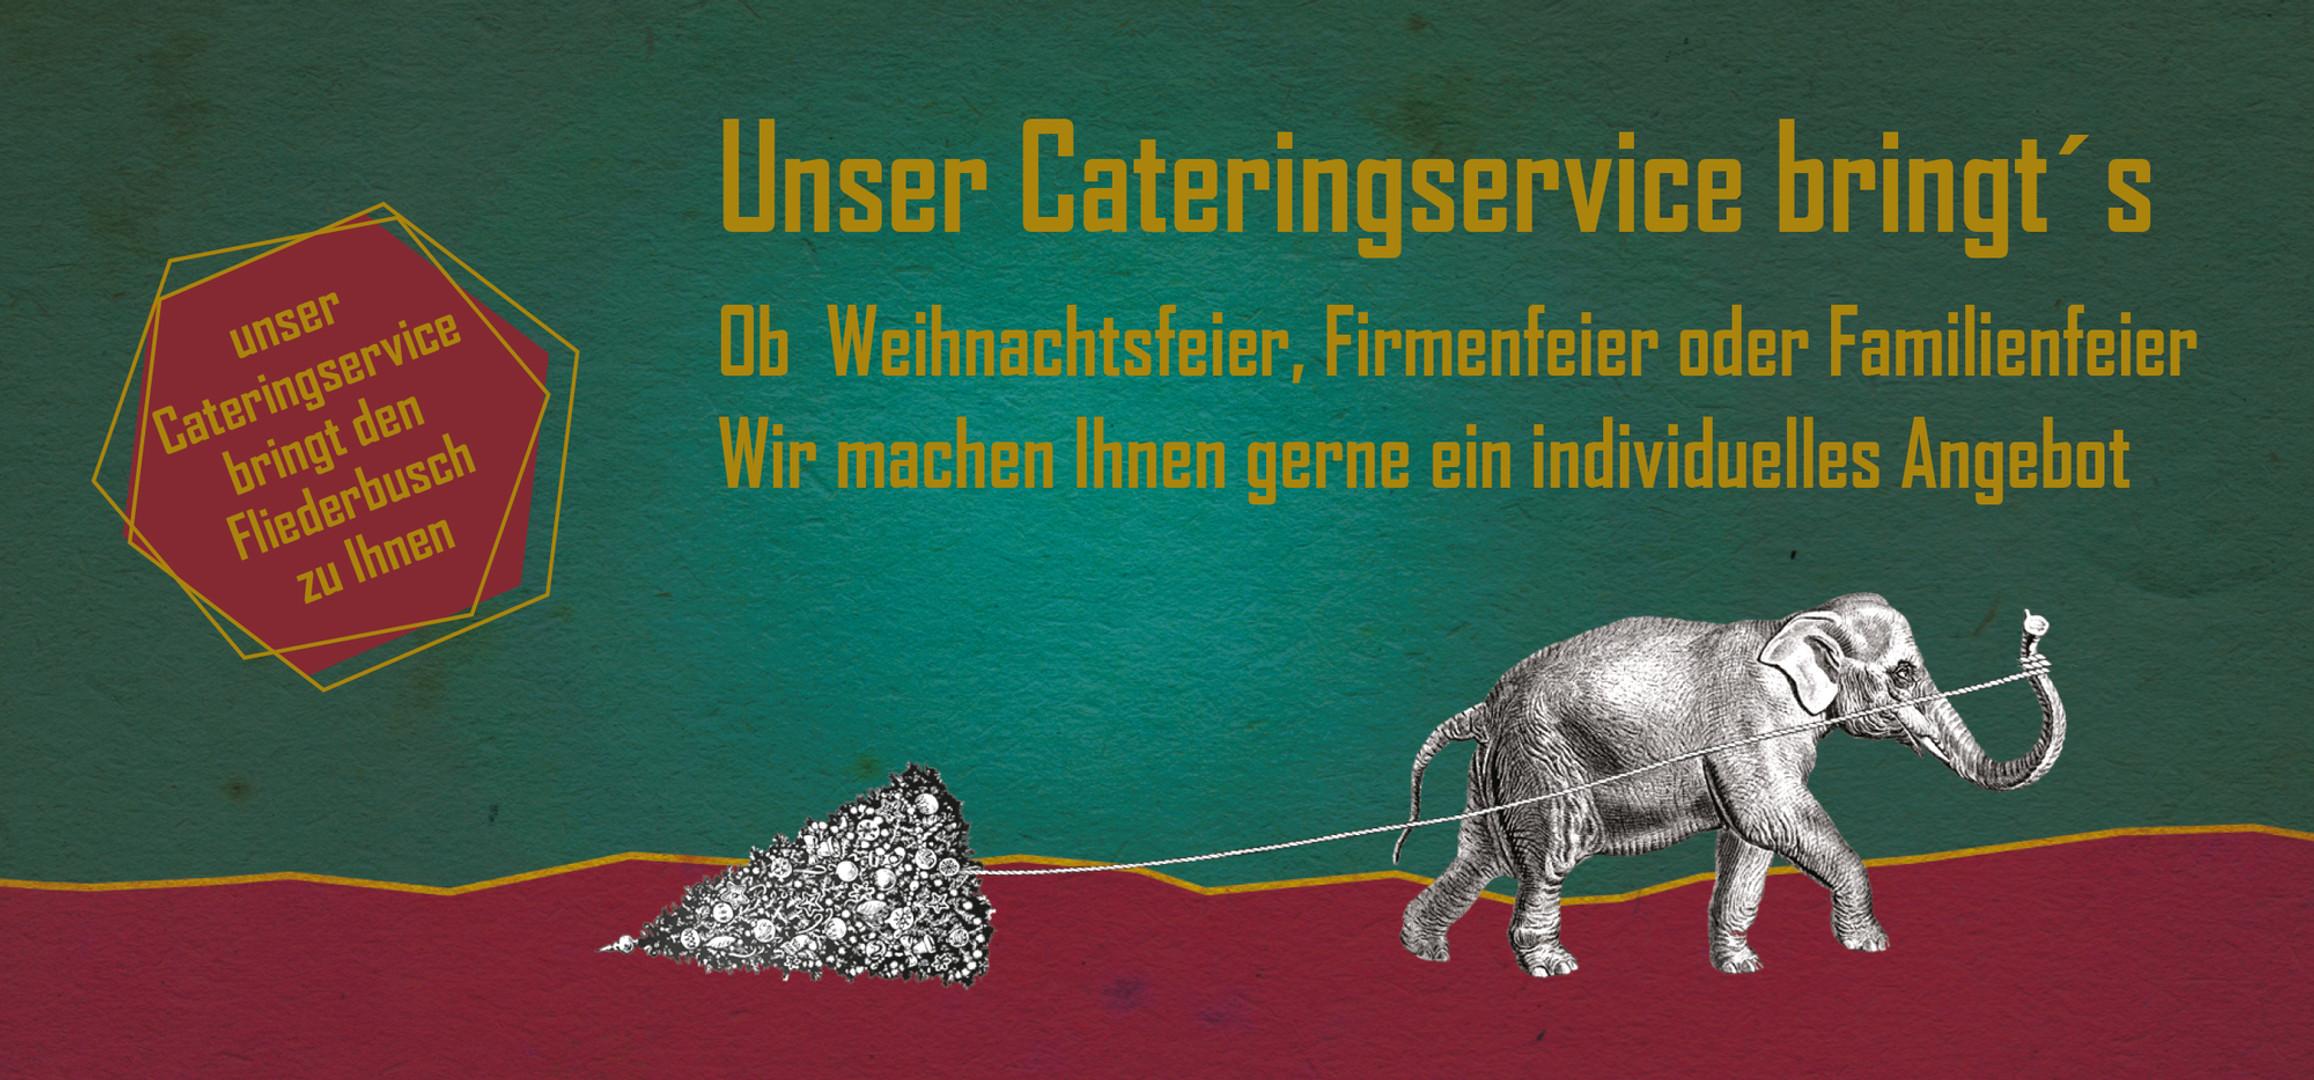 Catering (2).jpg